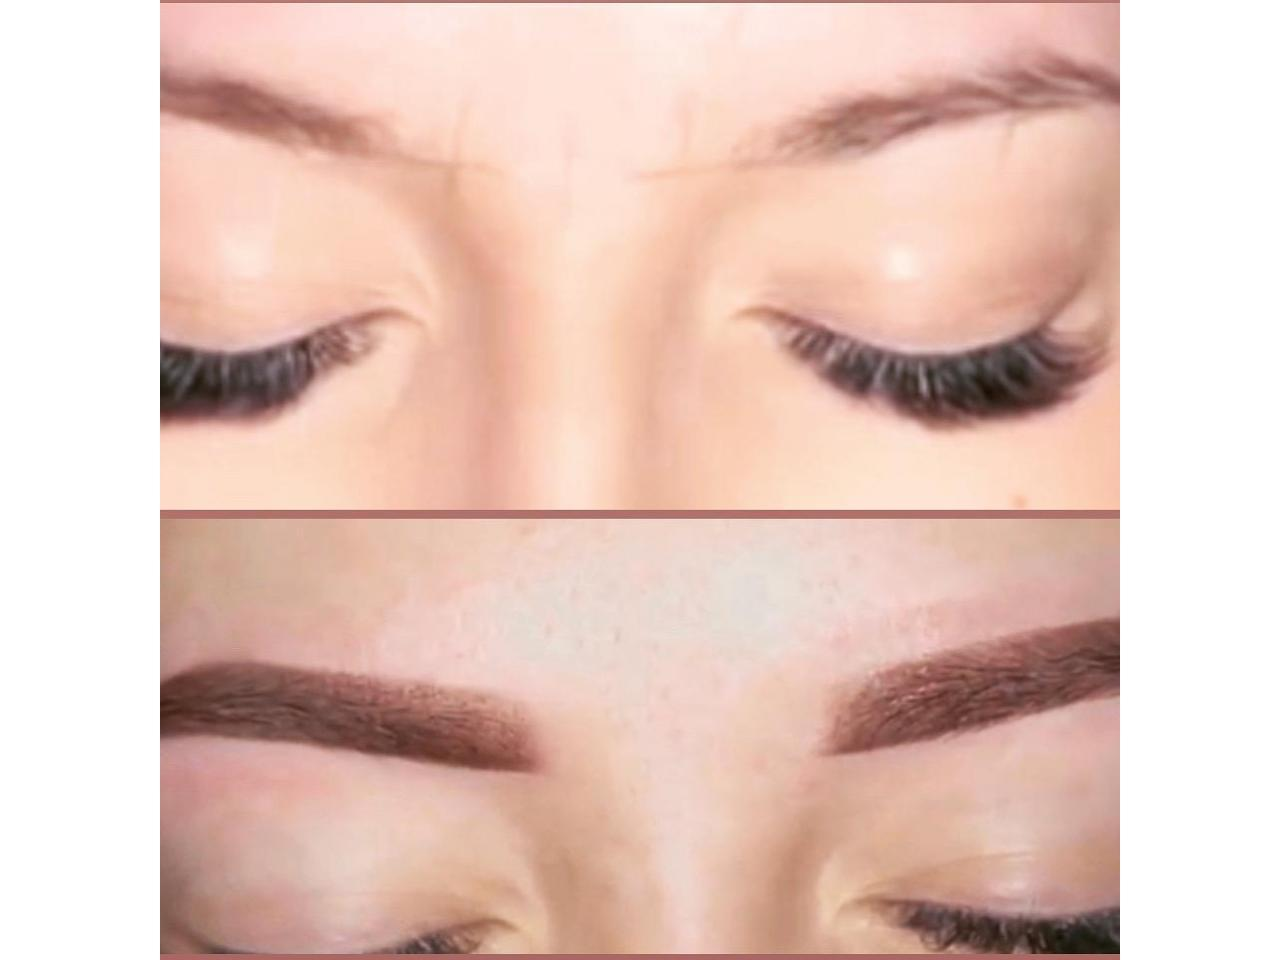 Permanent makeup artist/Microblading - 5